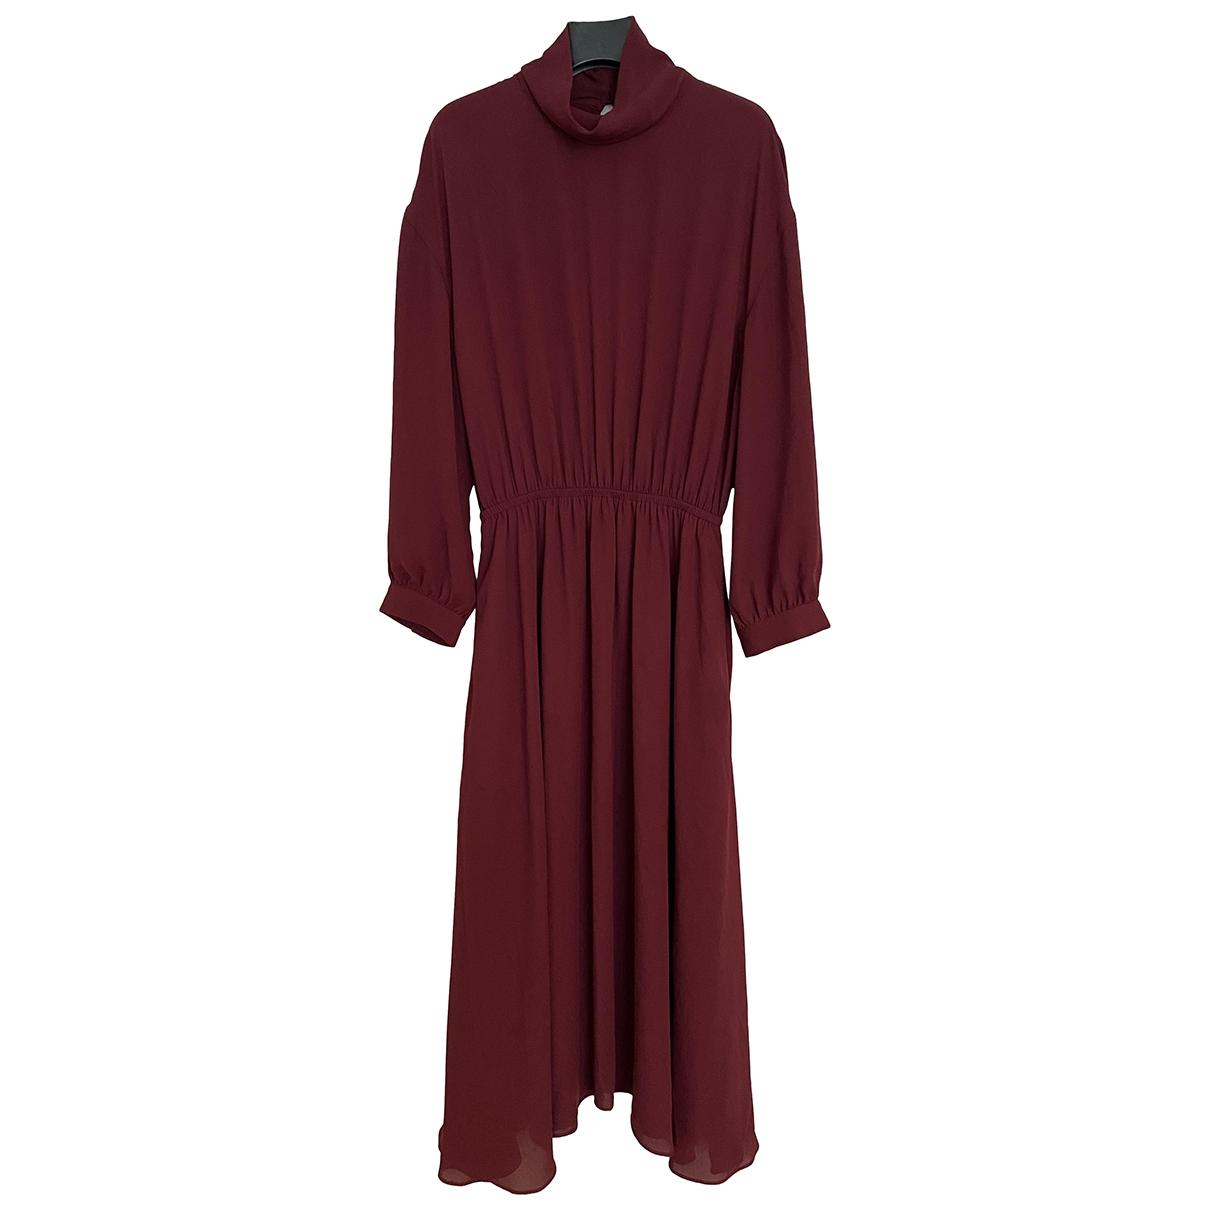 Babaton \N Kleid in  Bordeauxrot Polyester